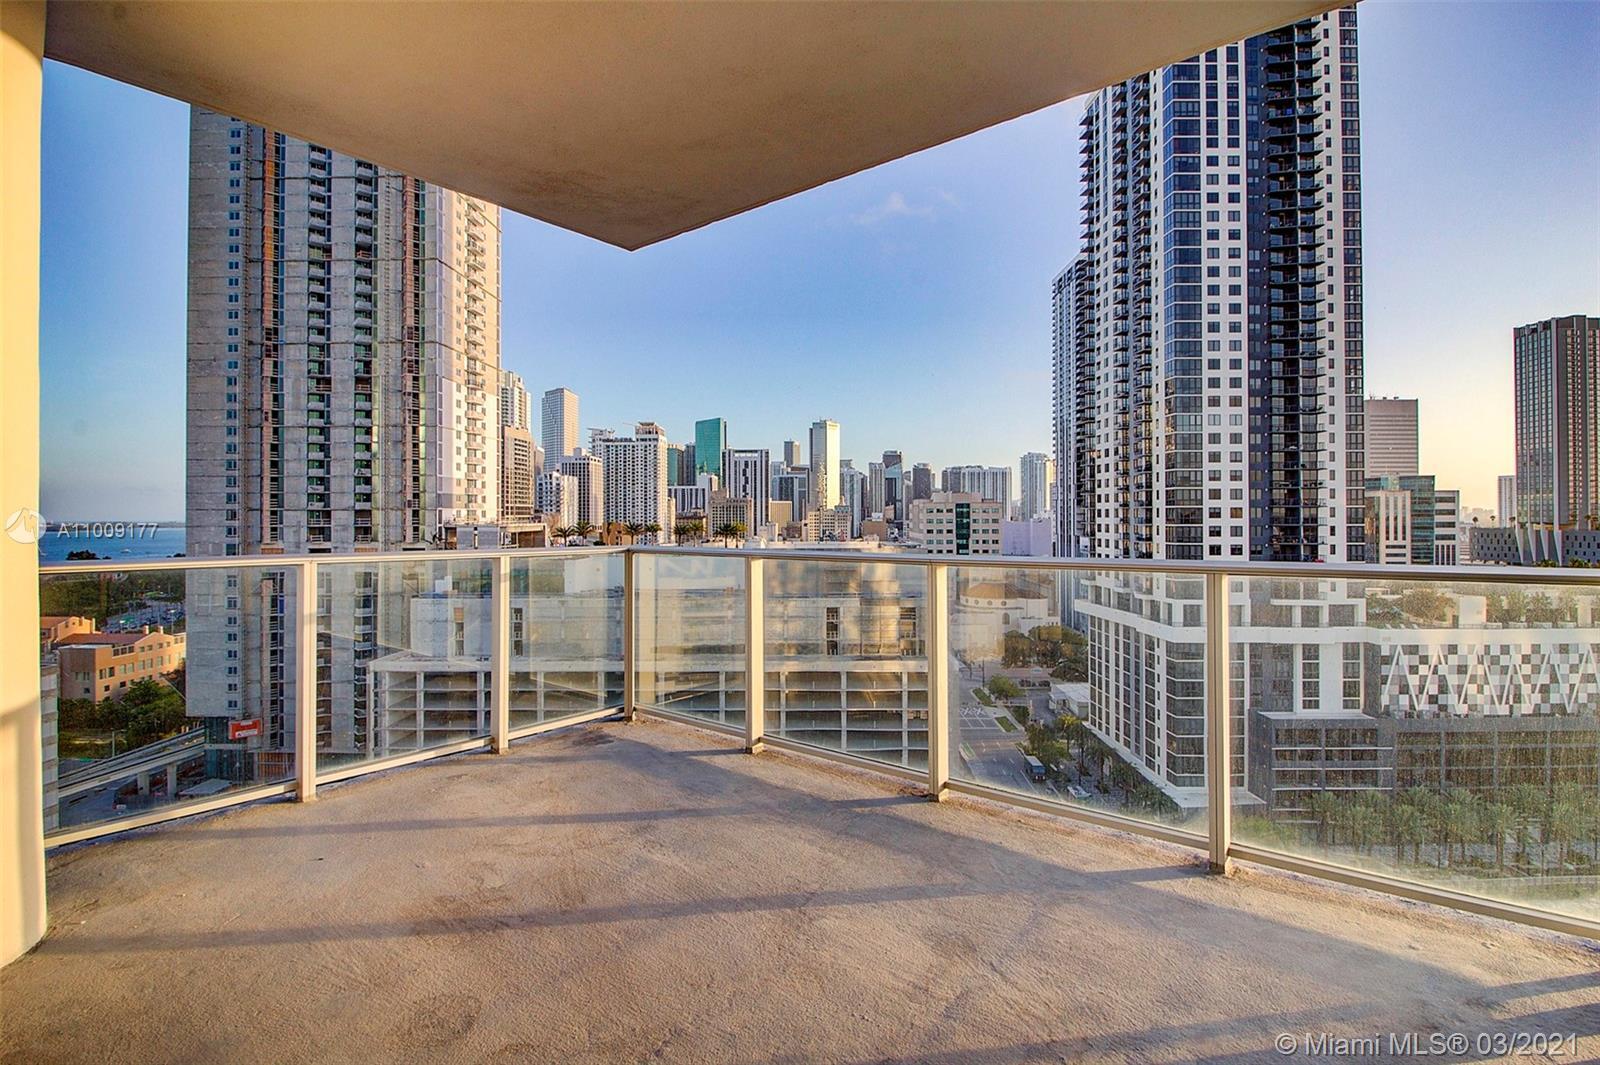 Paramount Miami Worldcenter #1411 - 851 NE 1st Ave #1411, Miami, FL 33132